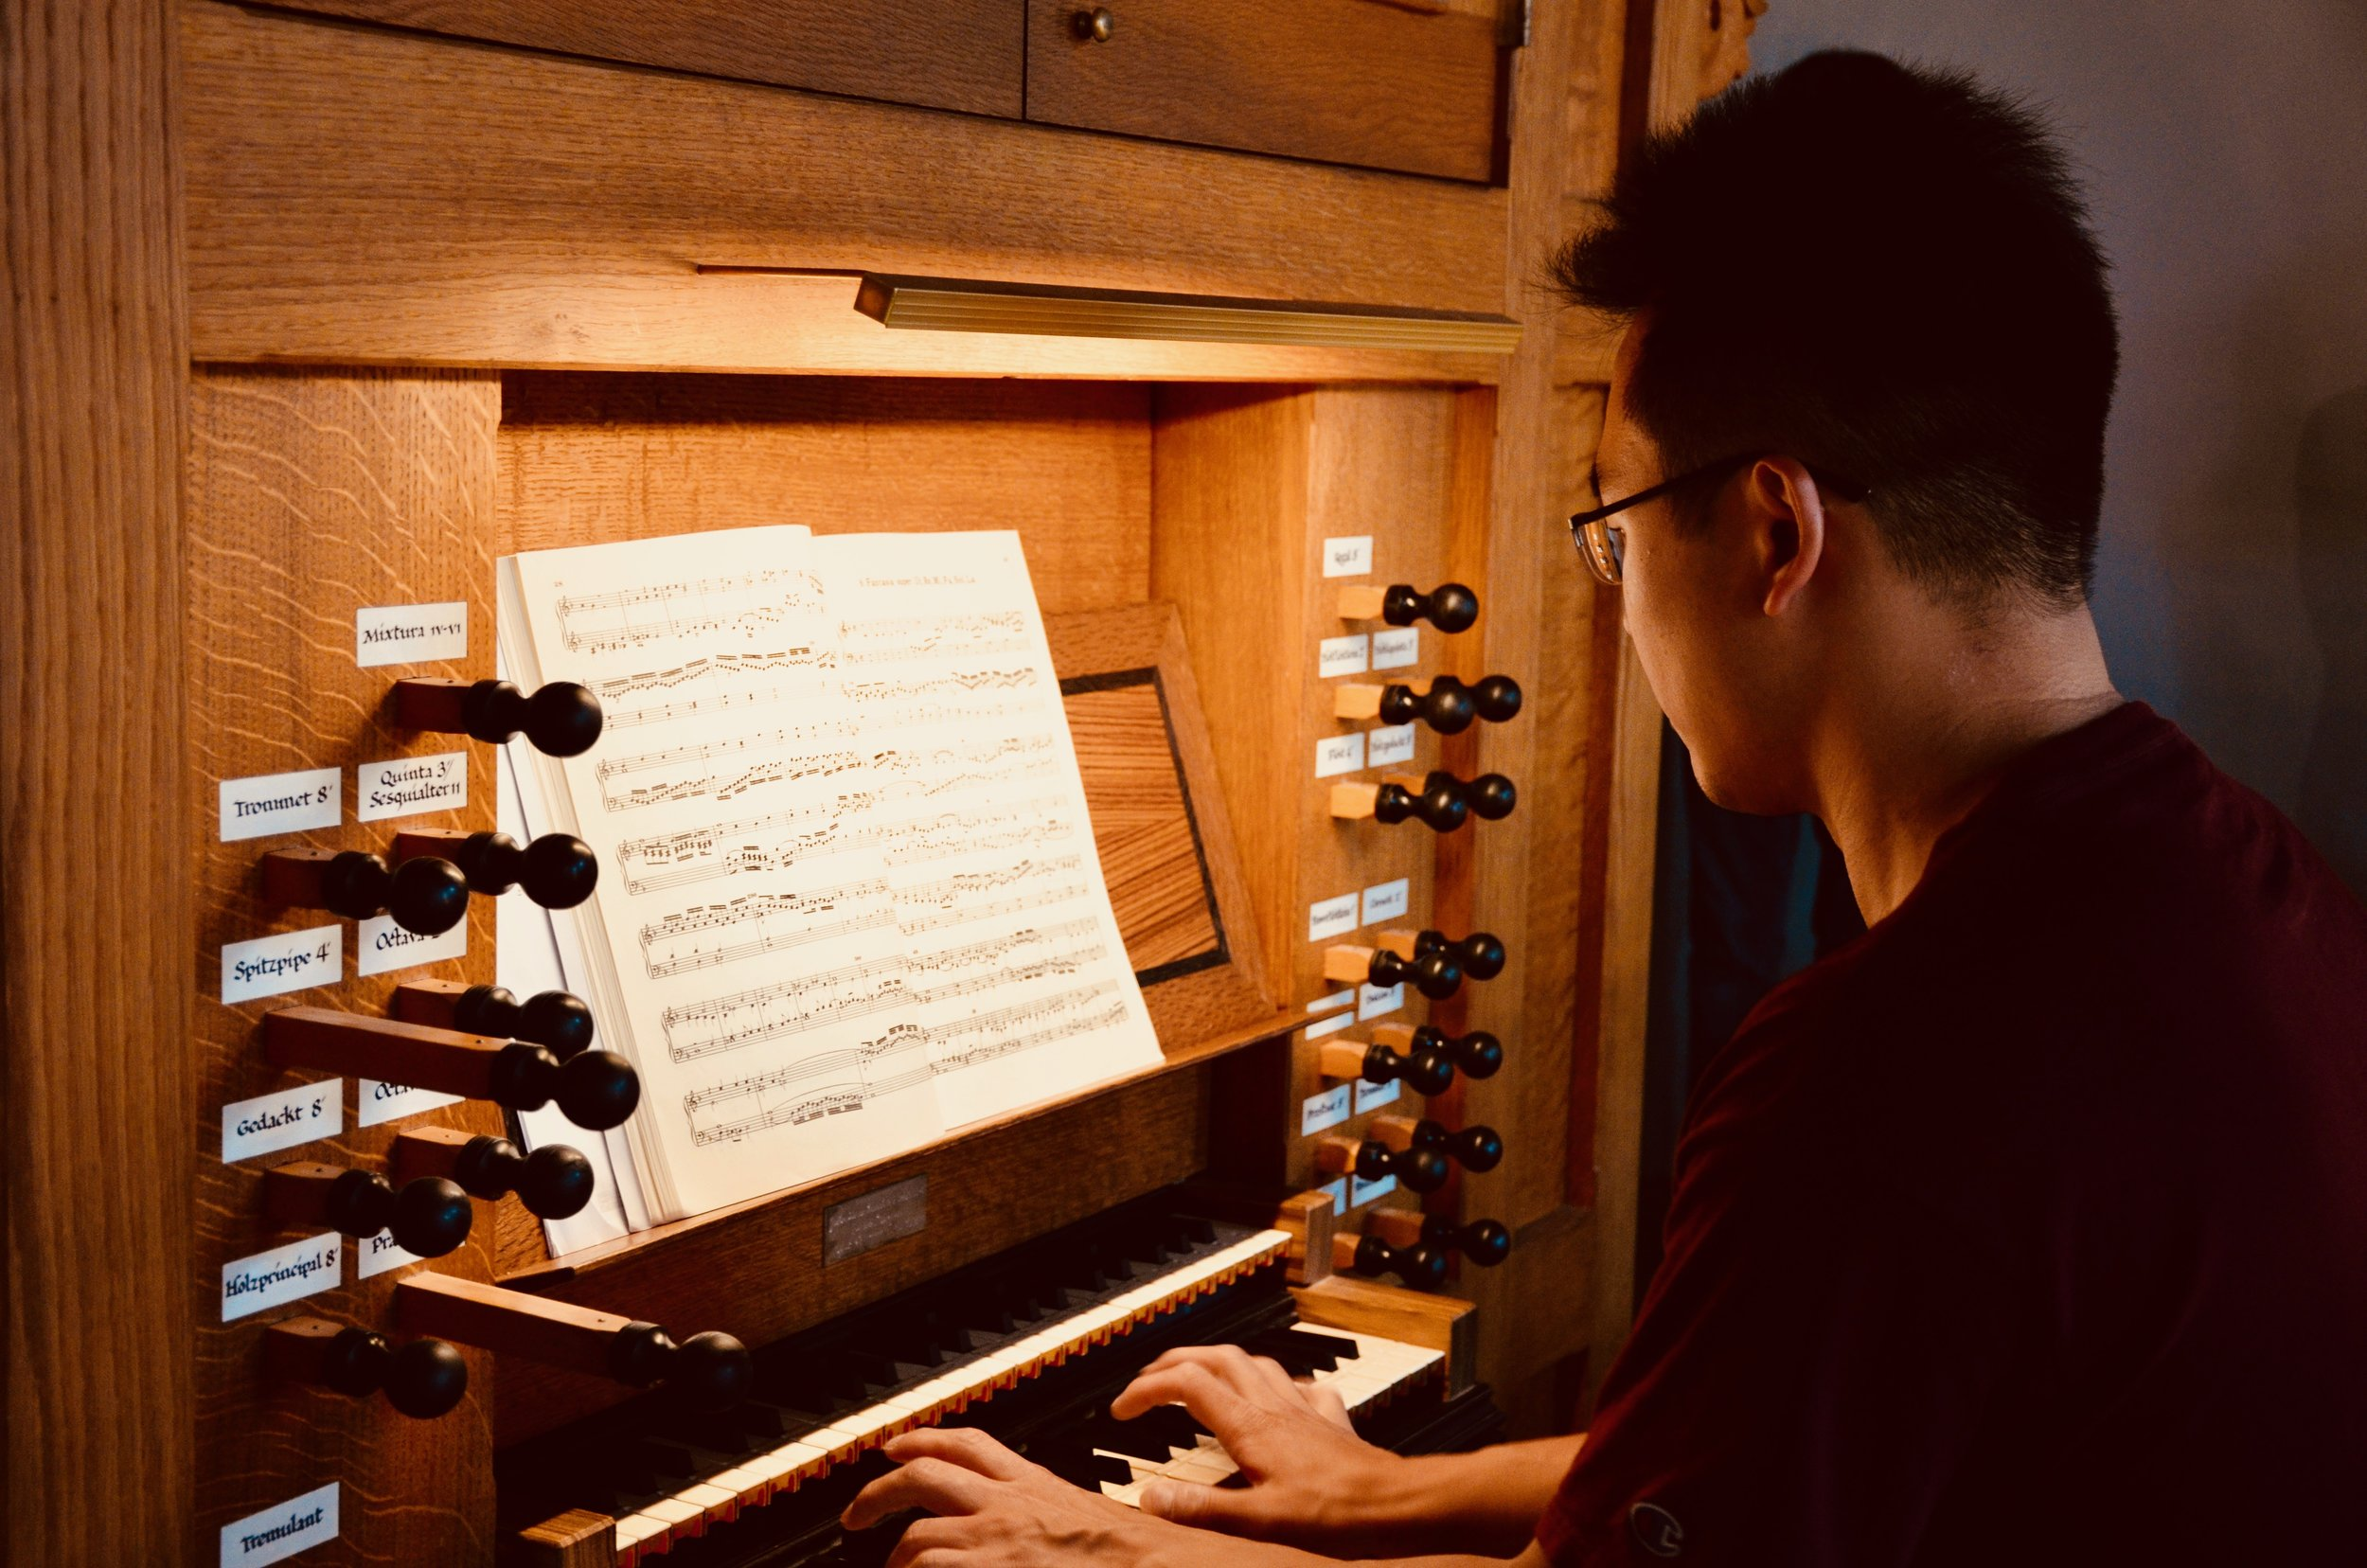 Adrian Cho plays the 1992 Brombaugh organ, Haga Church, Göteborg, Sweden.